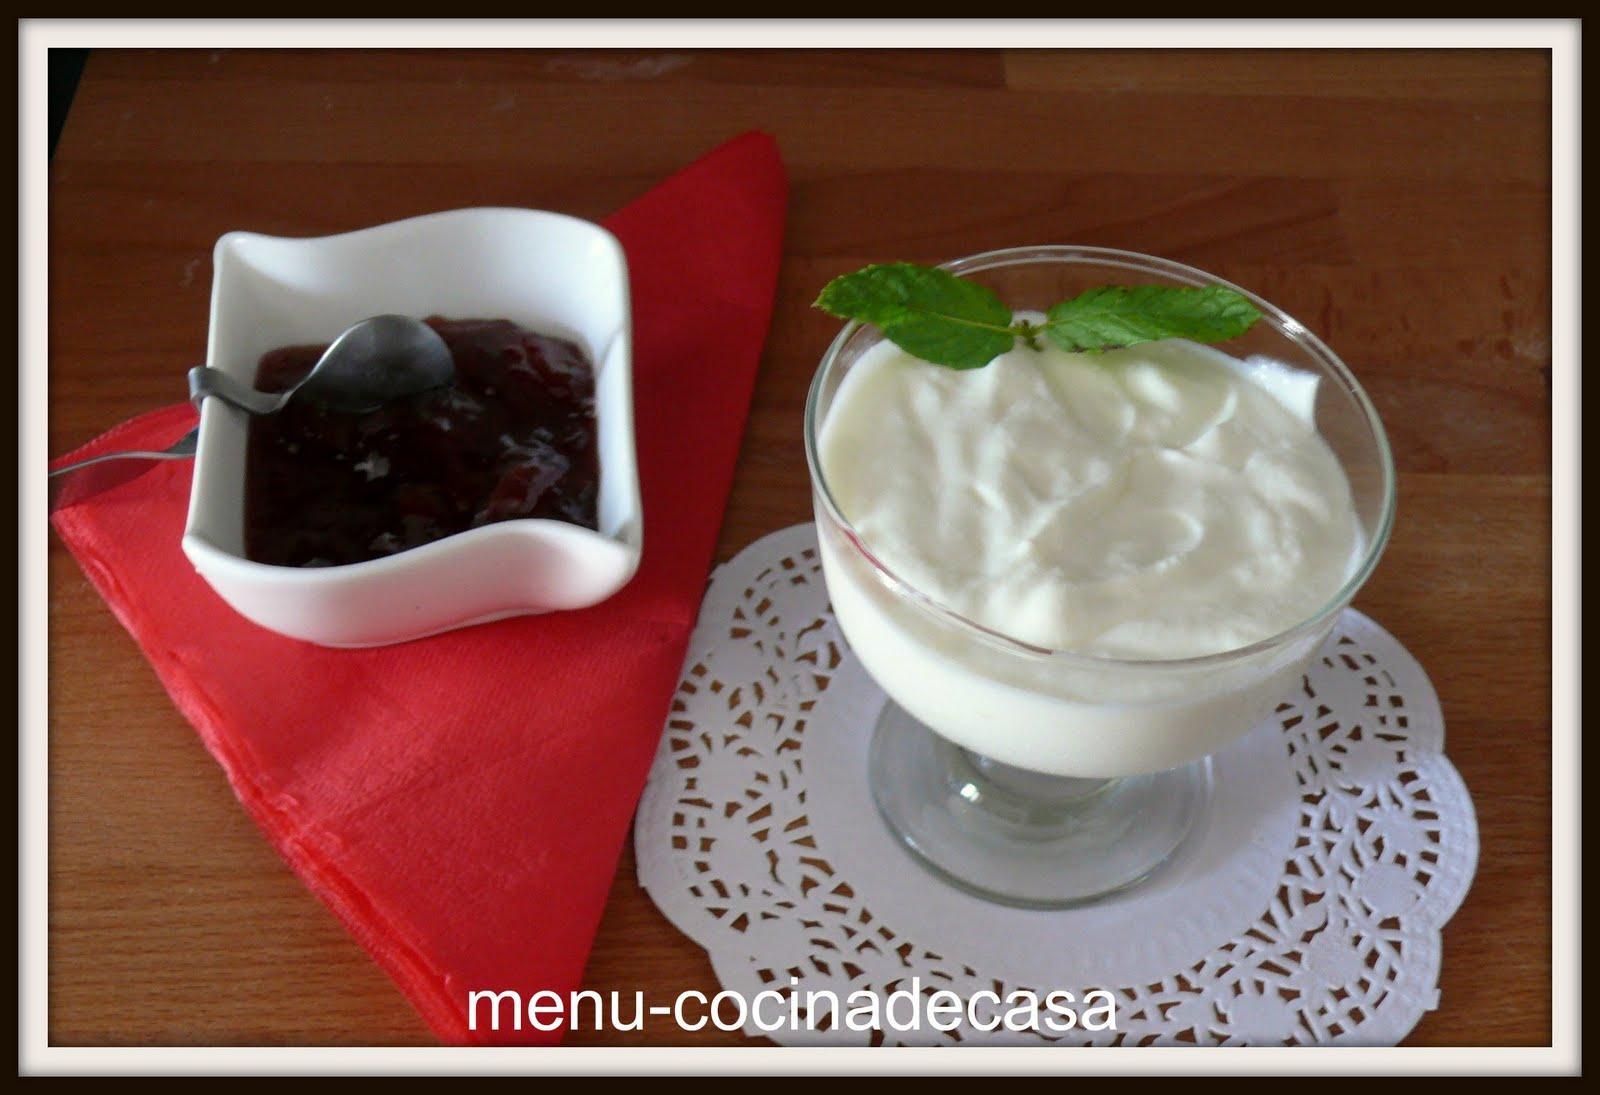 Menu cocinadecasa mousse de yogurt - Mouse de yogurt ...